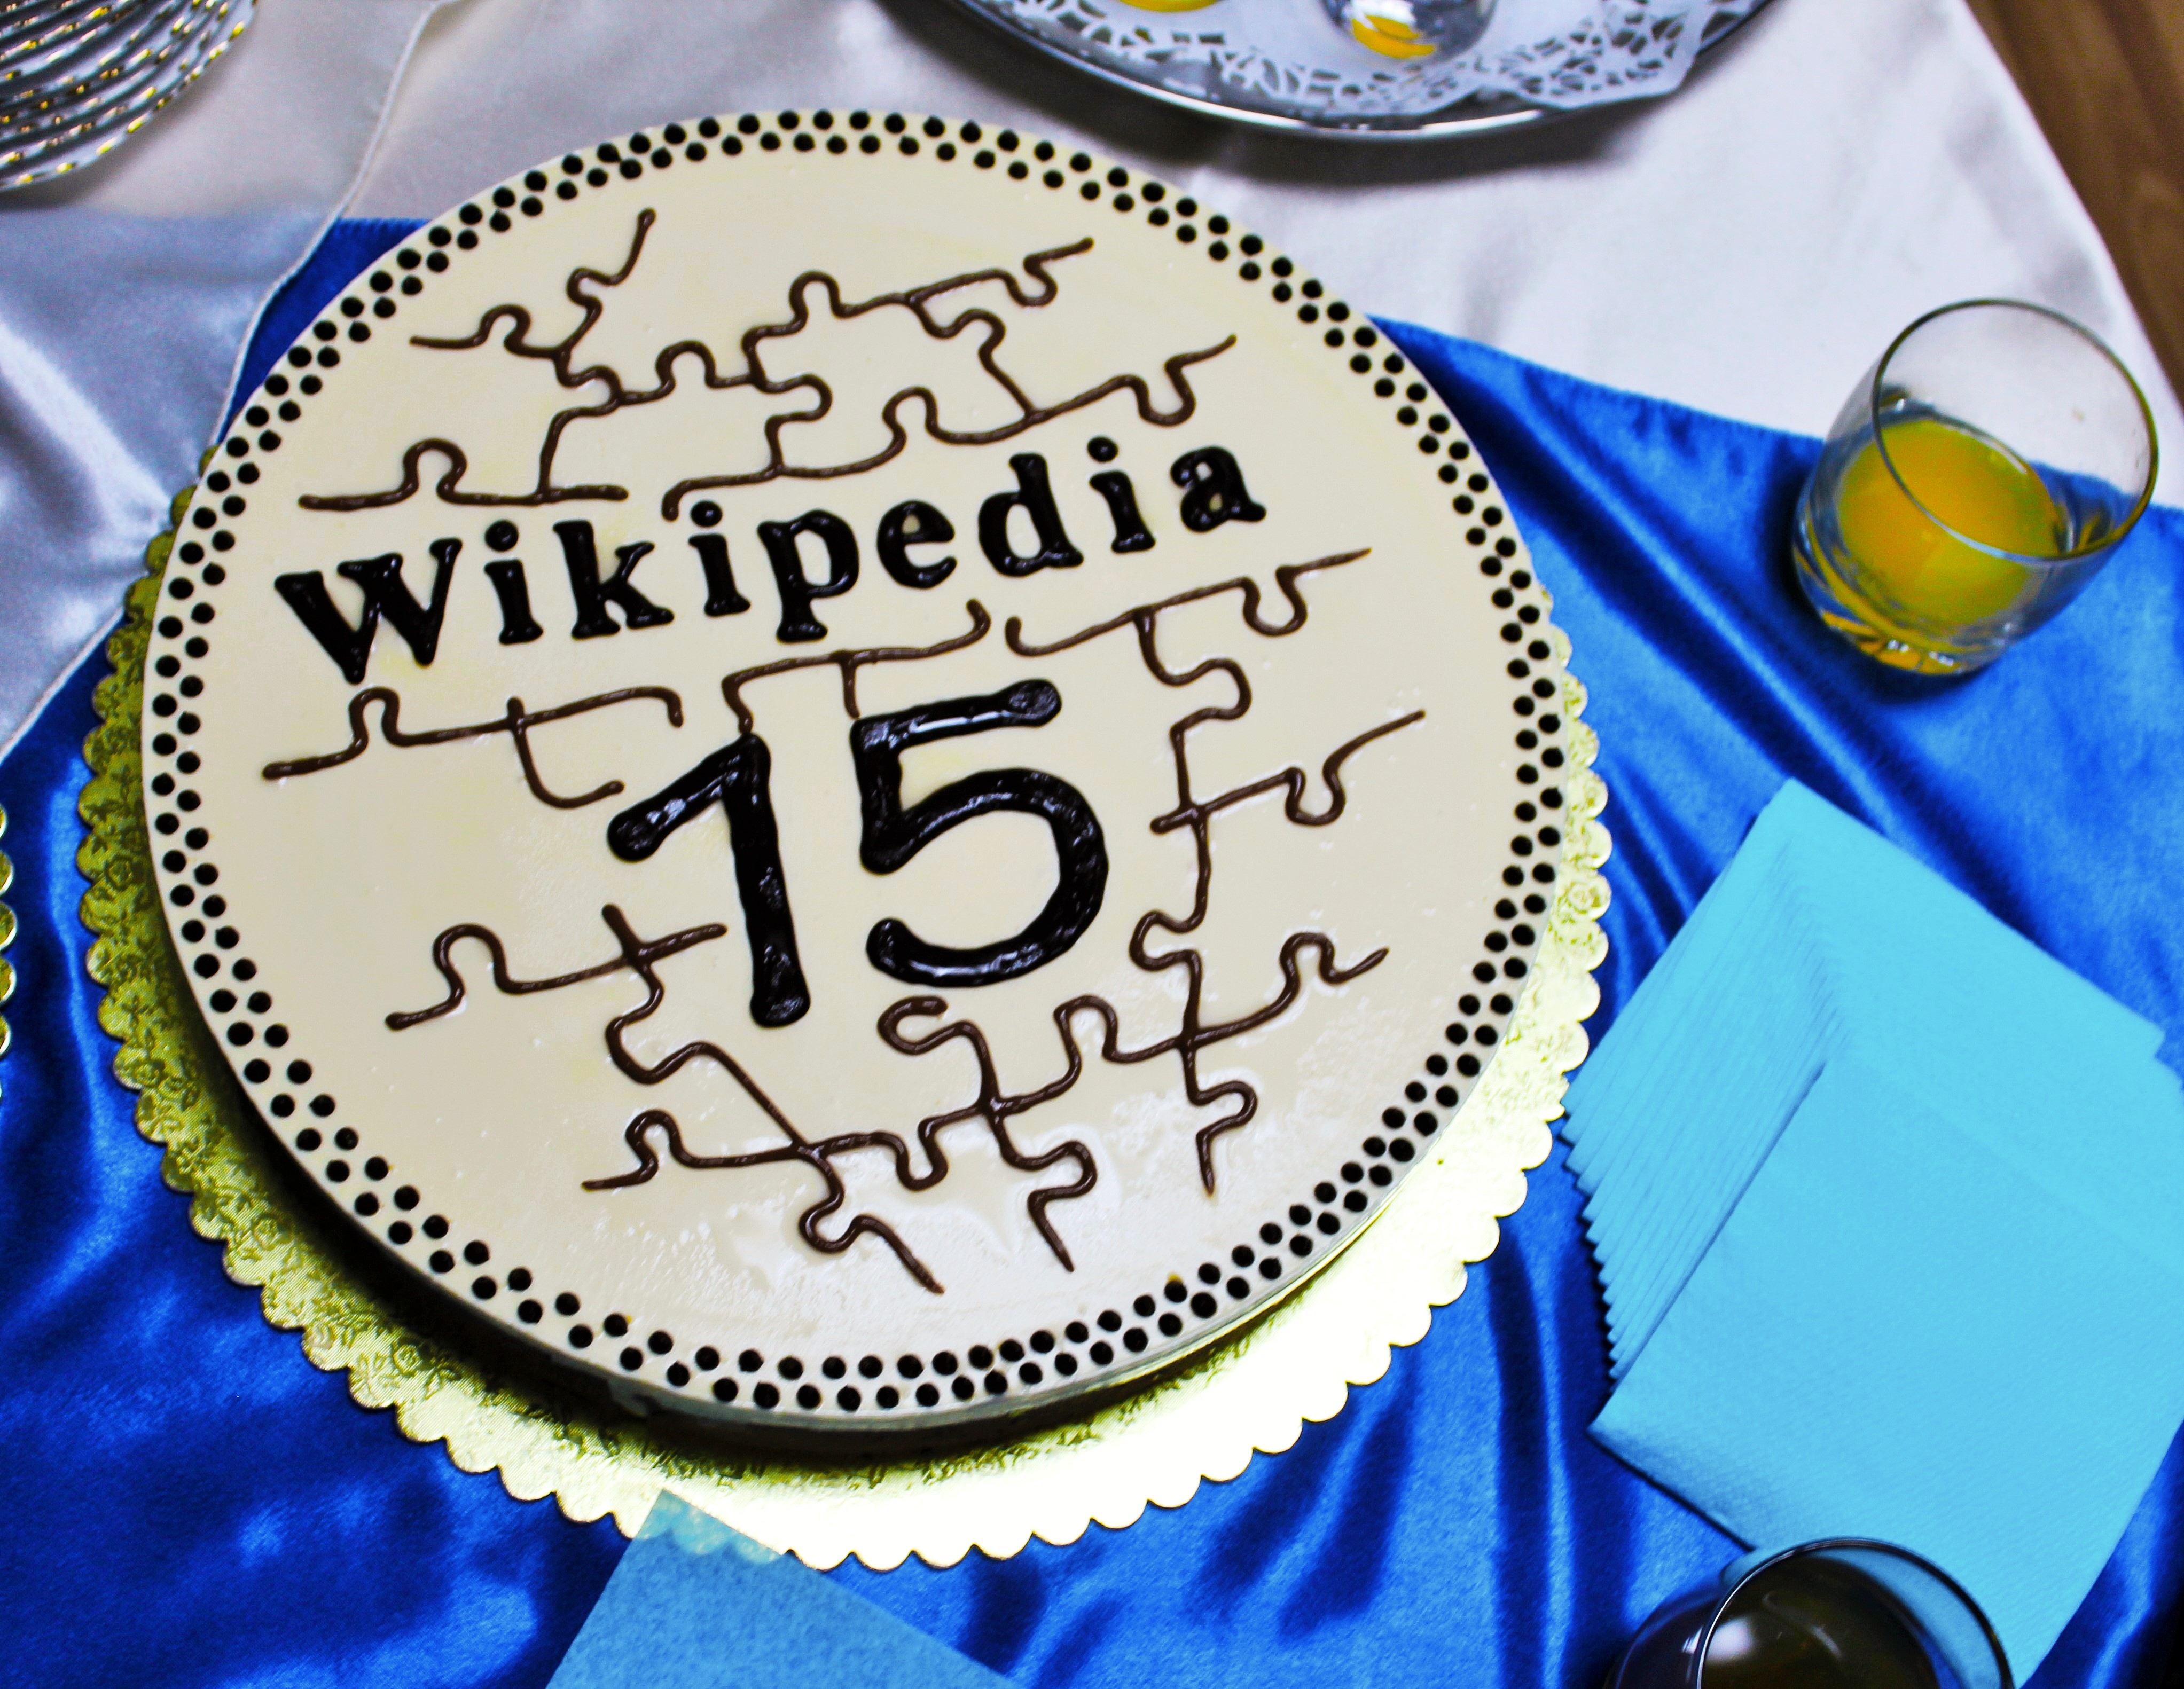 Terrific File Armenian Wiki Birthday Cake 2016 02 Jpg Wikimedia Commons Funny Birthday Cards Online Aeocydamsfinfo